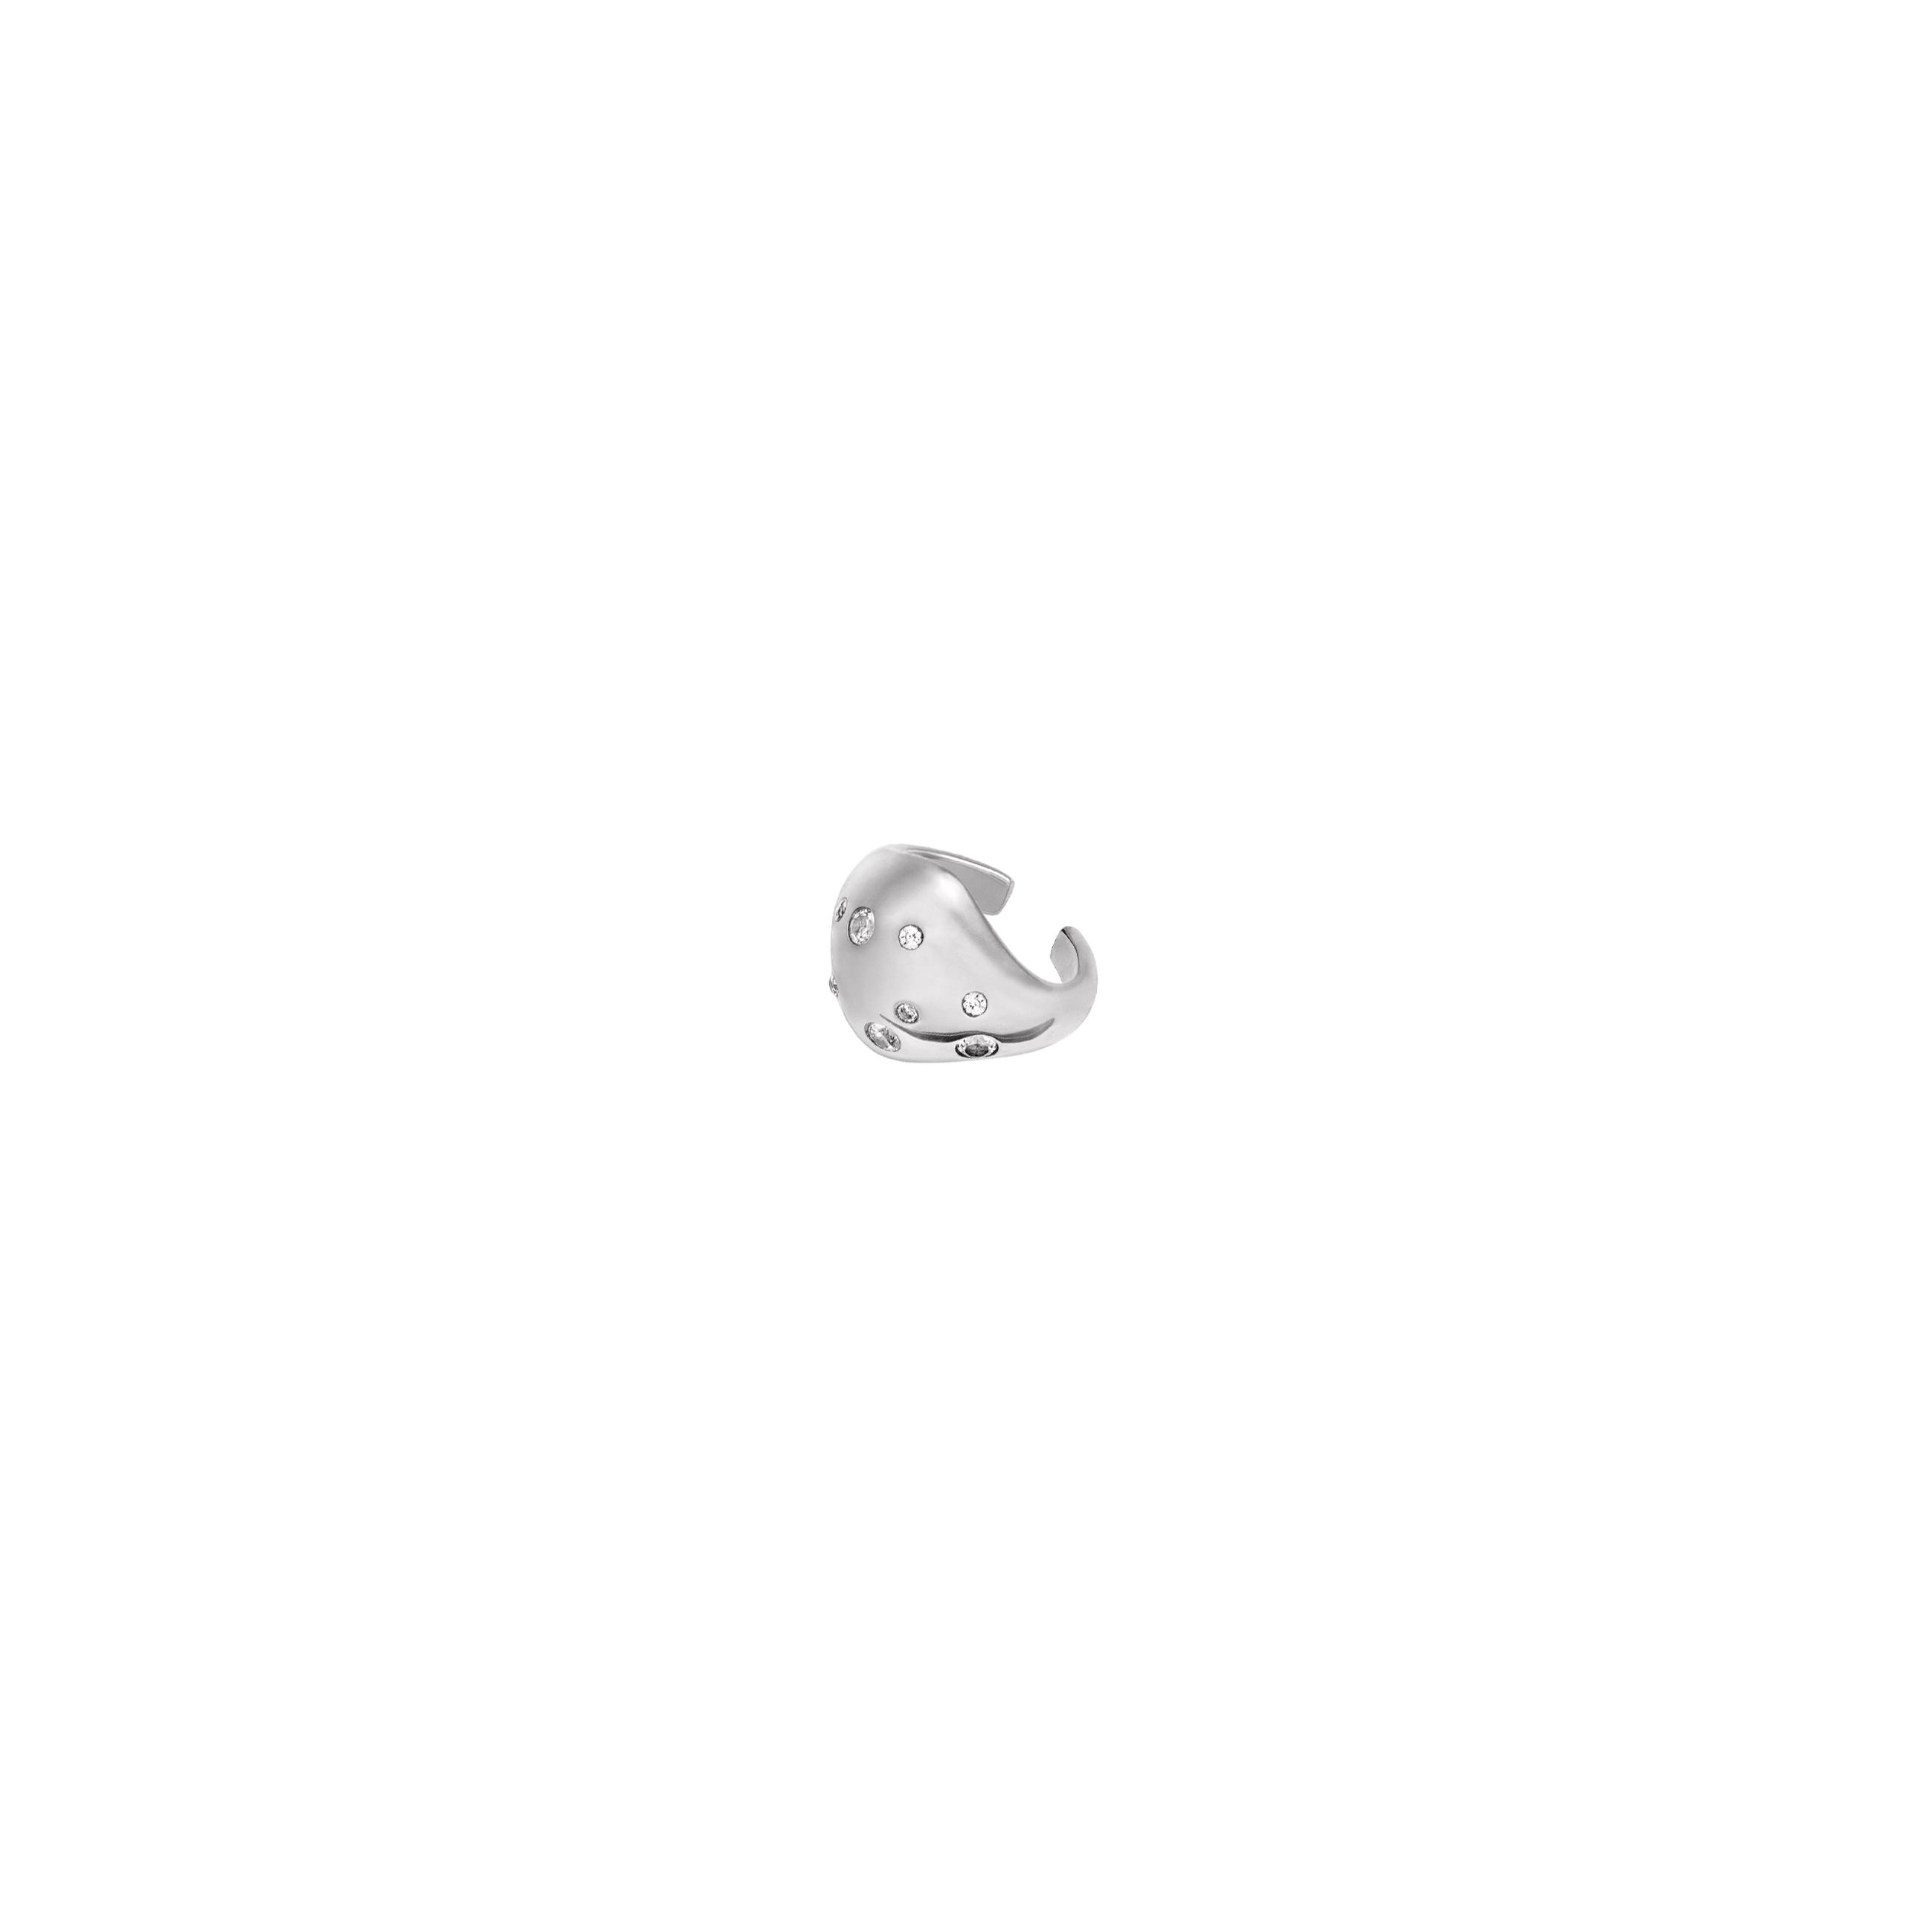 Nausznica Buble Zirconia Silver